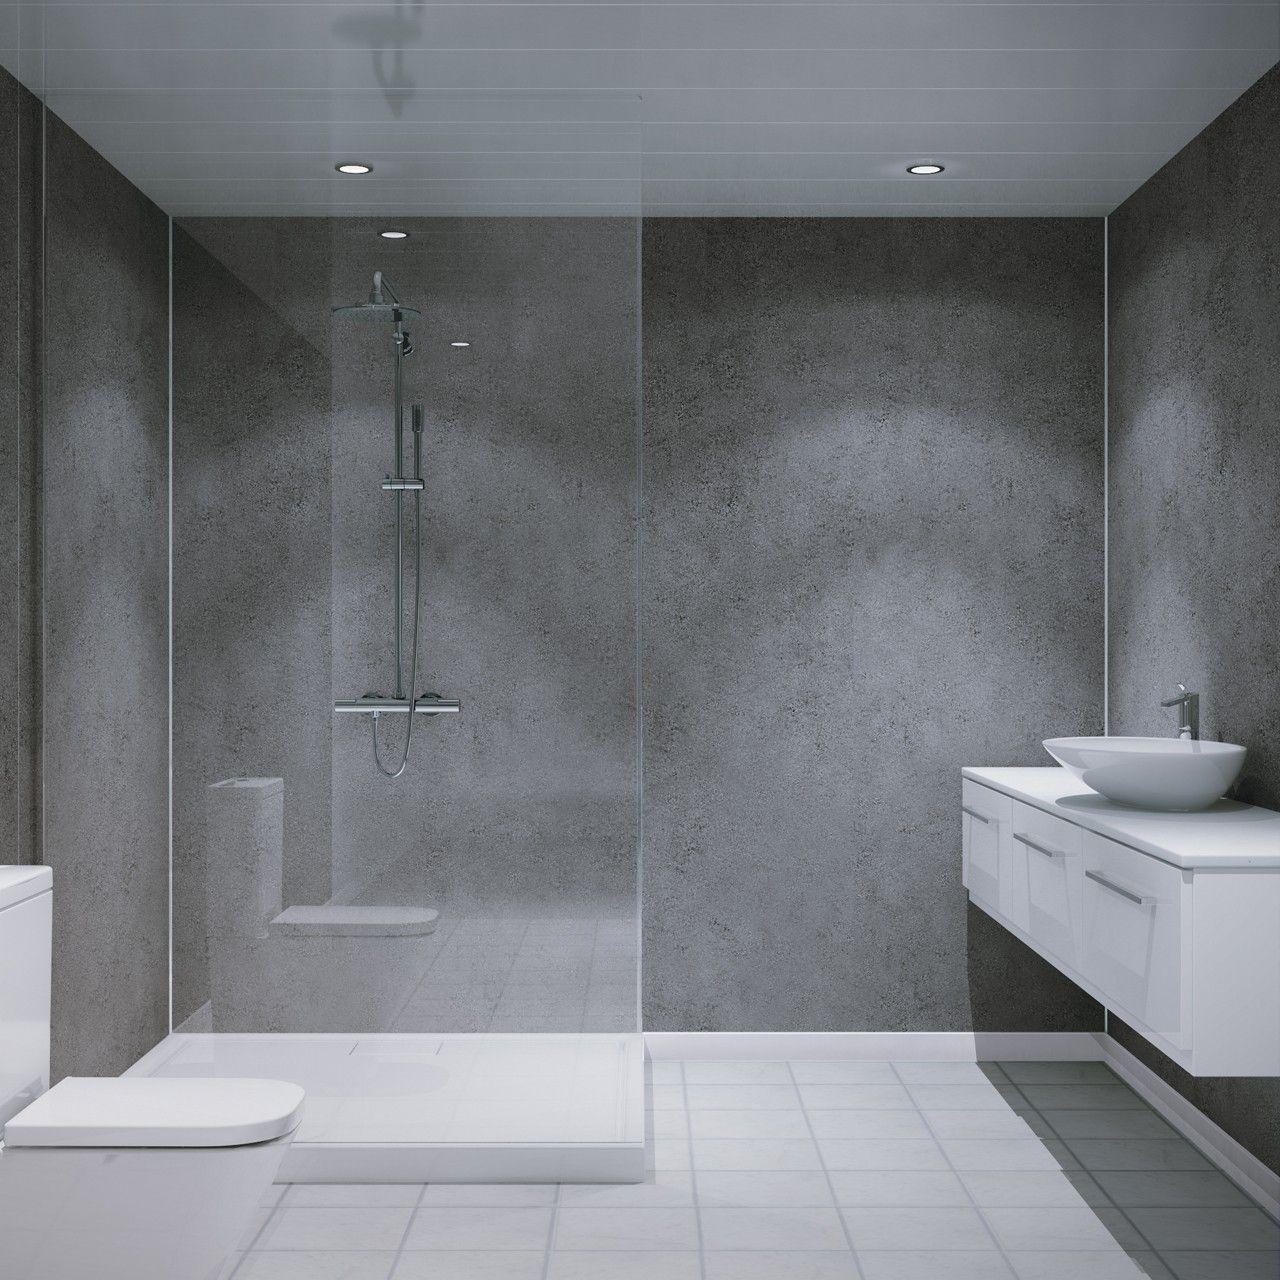 Multipanel Classic Textured Warm Mica Hydro Lock Tongue Groove Bathroom Wall Panel Bathroom Wall Panels Bathroom Wall Cladding Bathroom Cladding